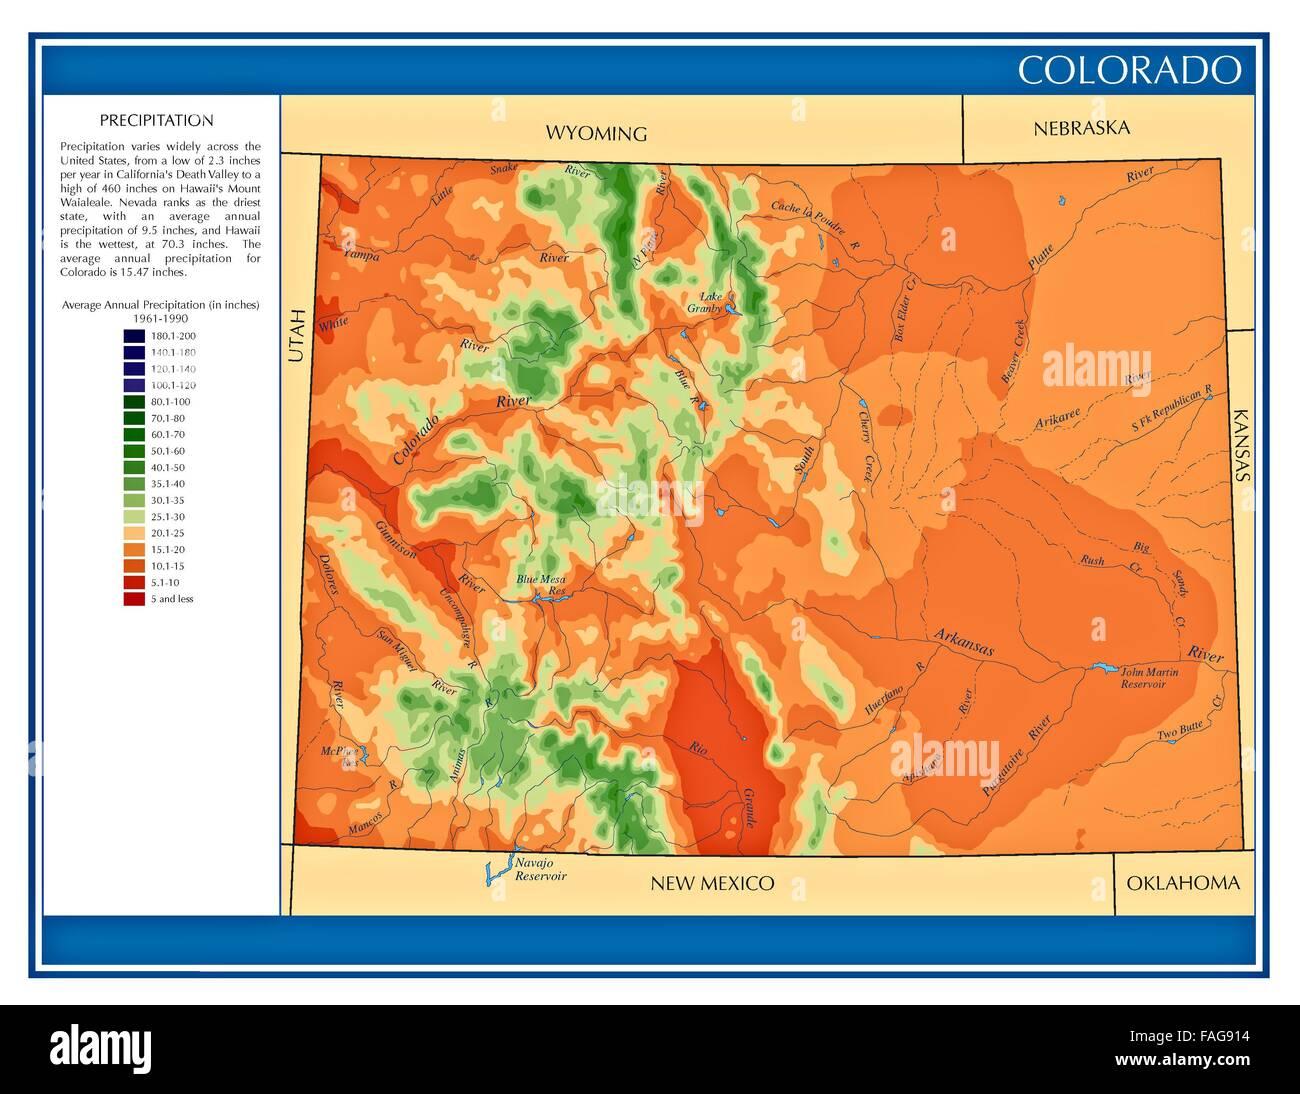 Colorado United States water precipitation statistics map by ...